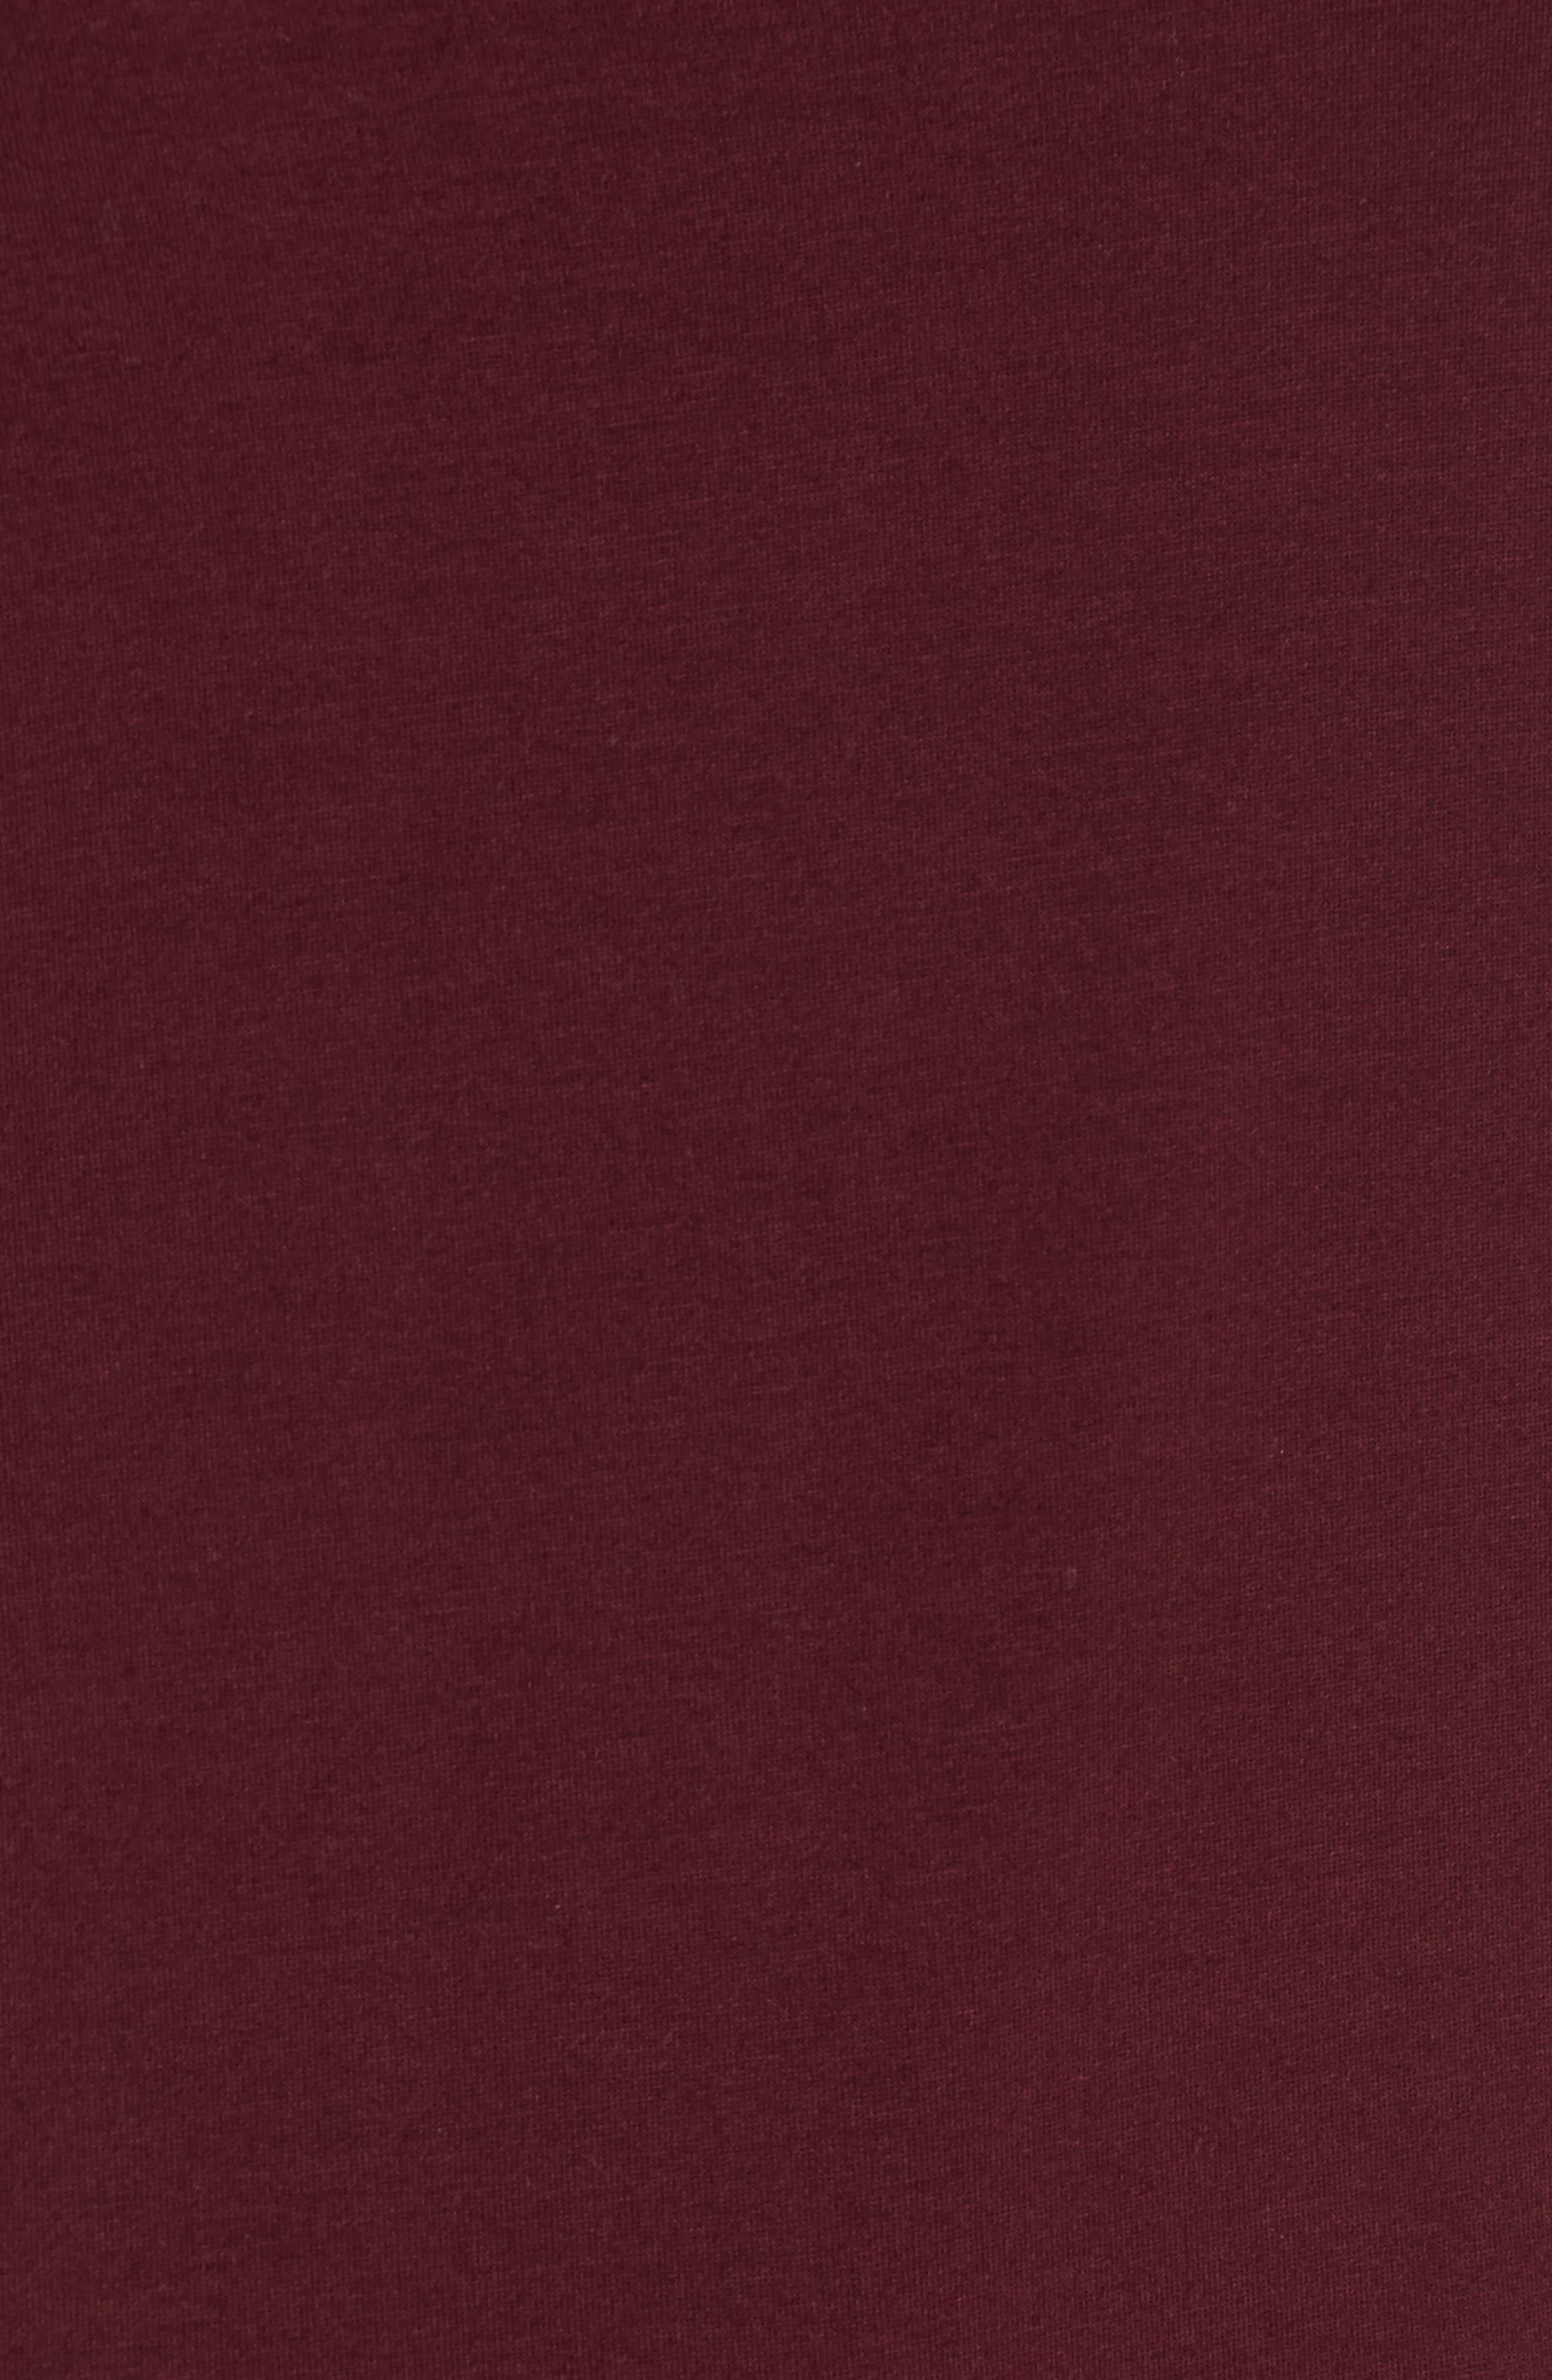 'Flannery' Stripe Stretch Jersey Turtleneck,                             Alternate thumbnail 5, color,                             Plum